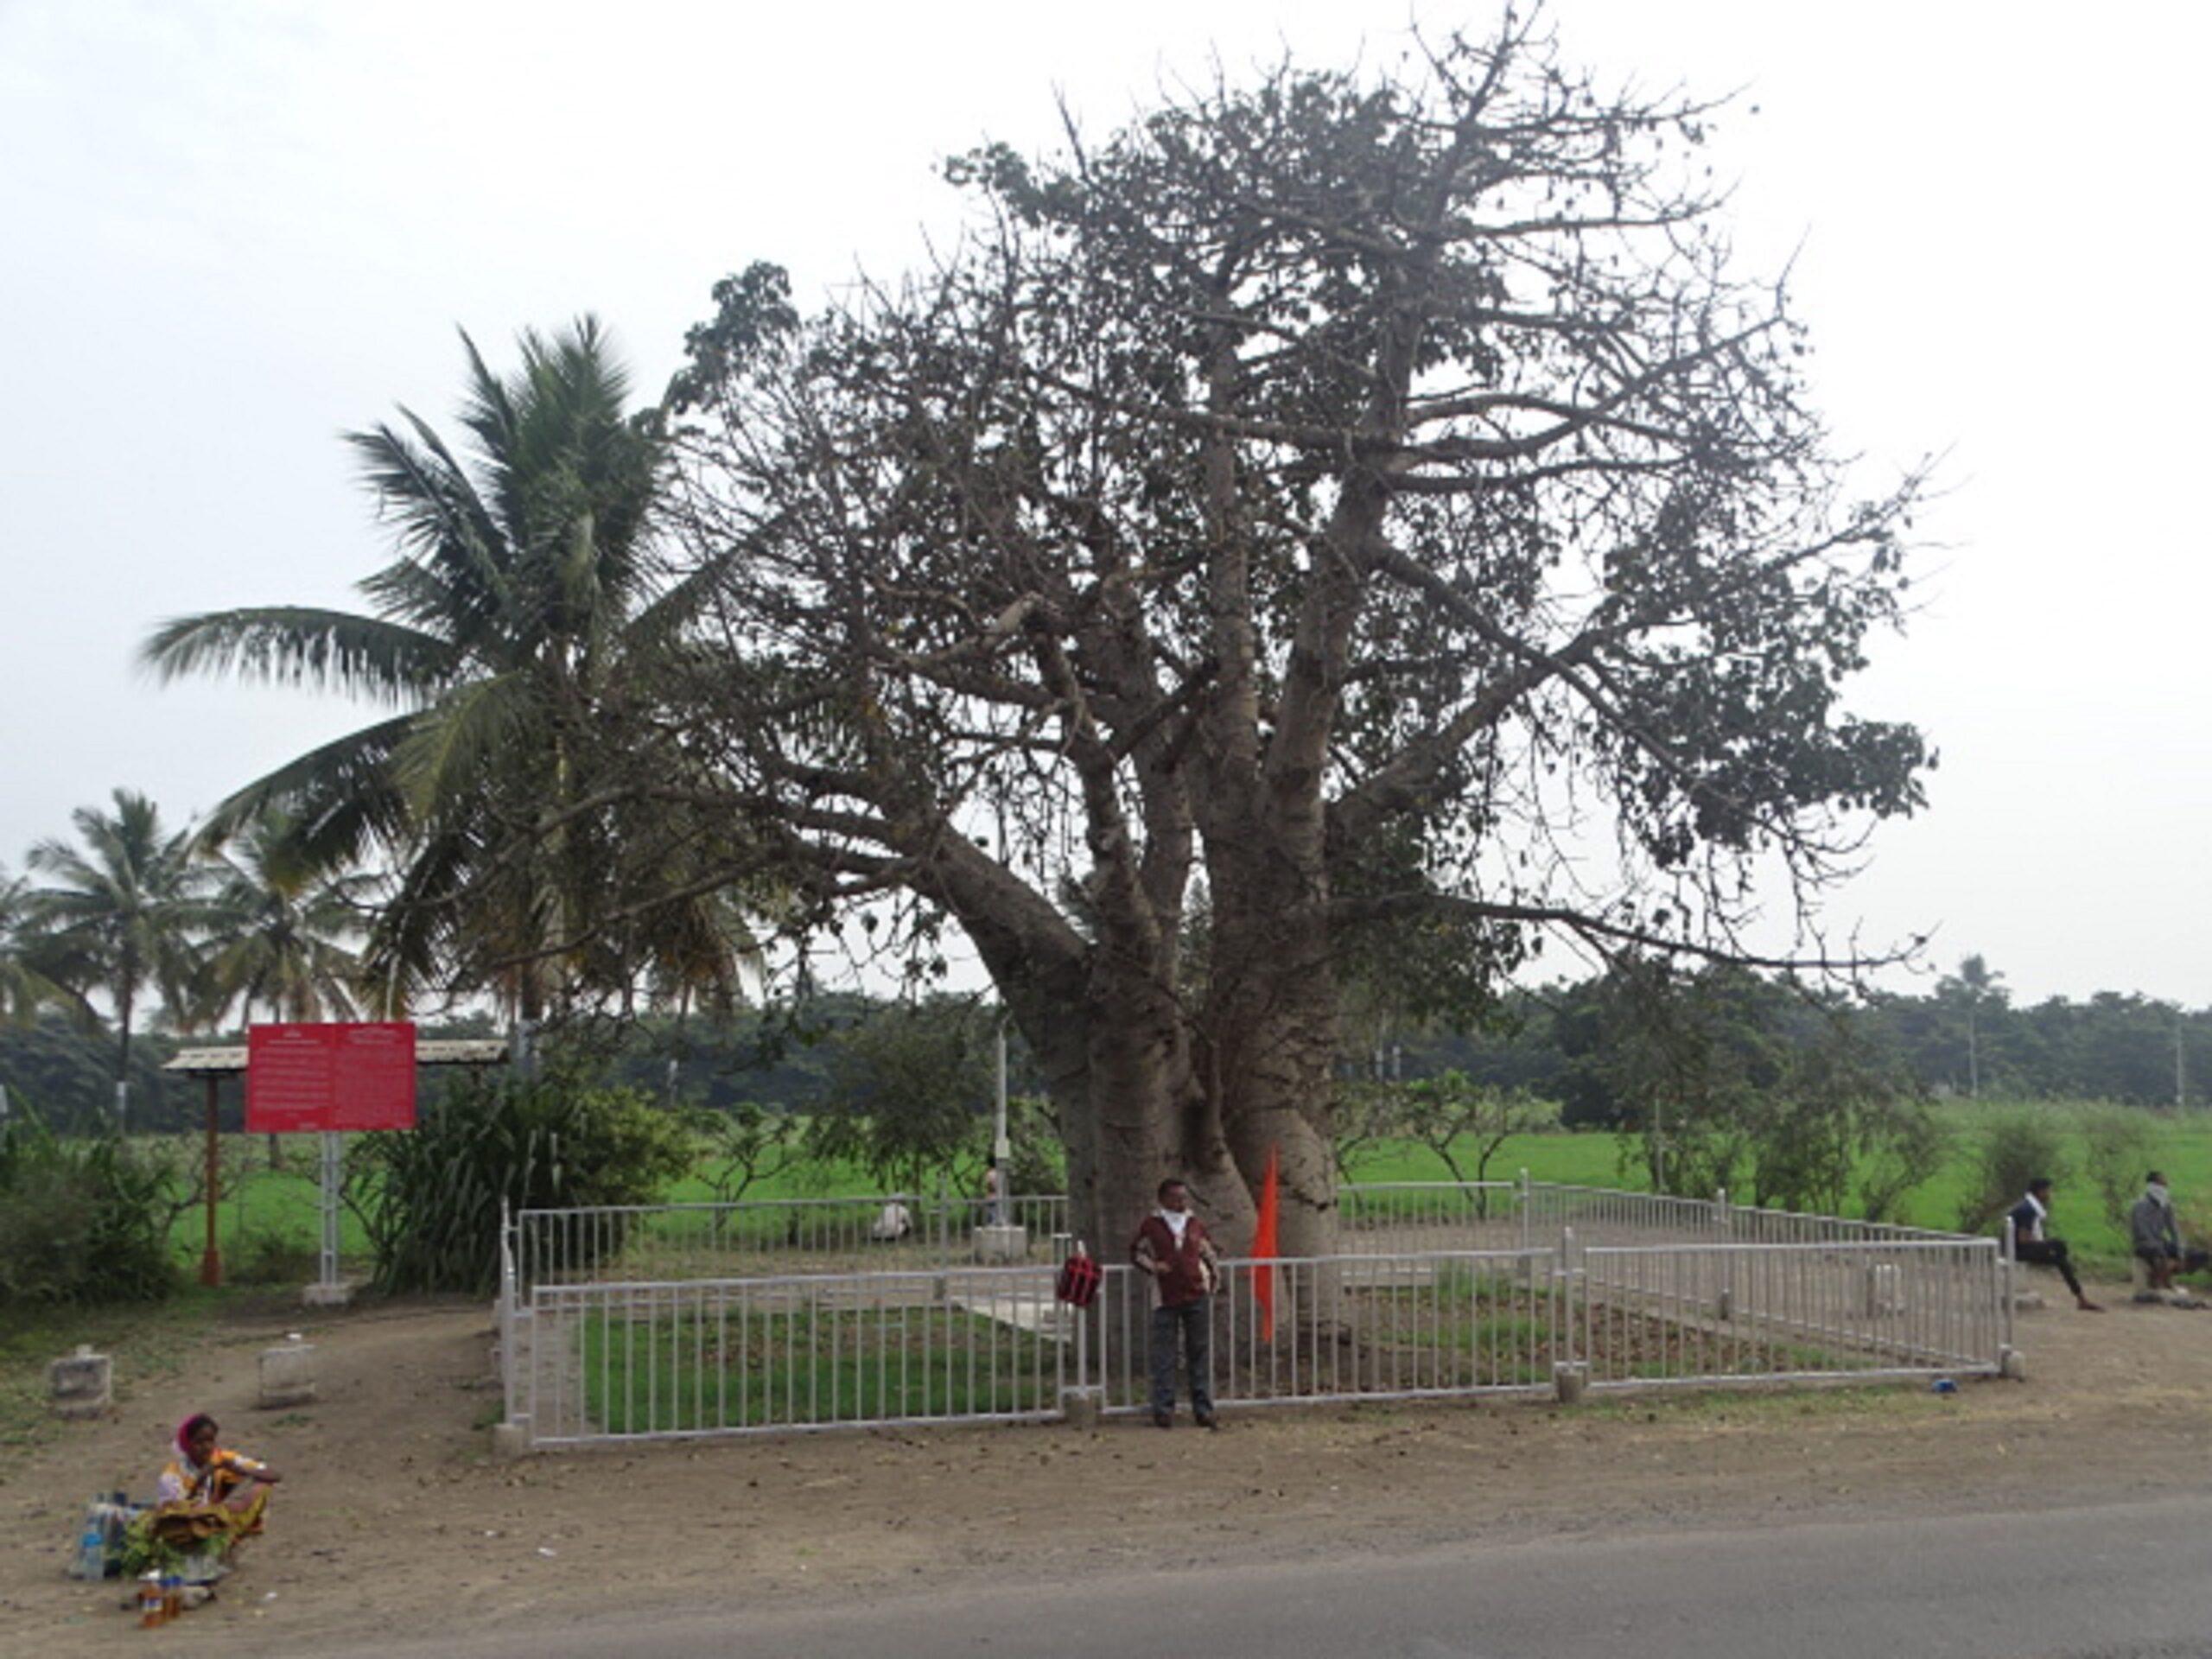 A Wishing Tree - A Panacea (A Kalpavriksha or Kalpataru), Nagar-Manmad Road, Shirdi, Maharashtra, India